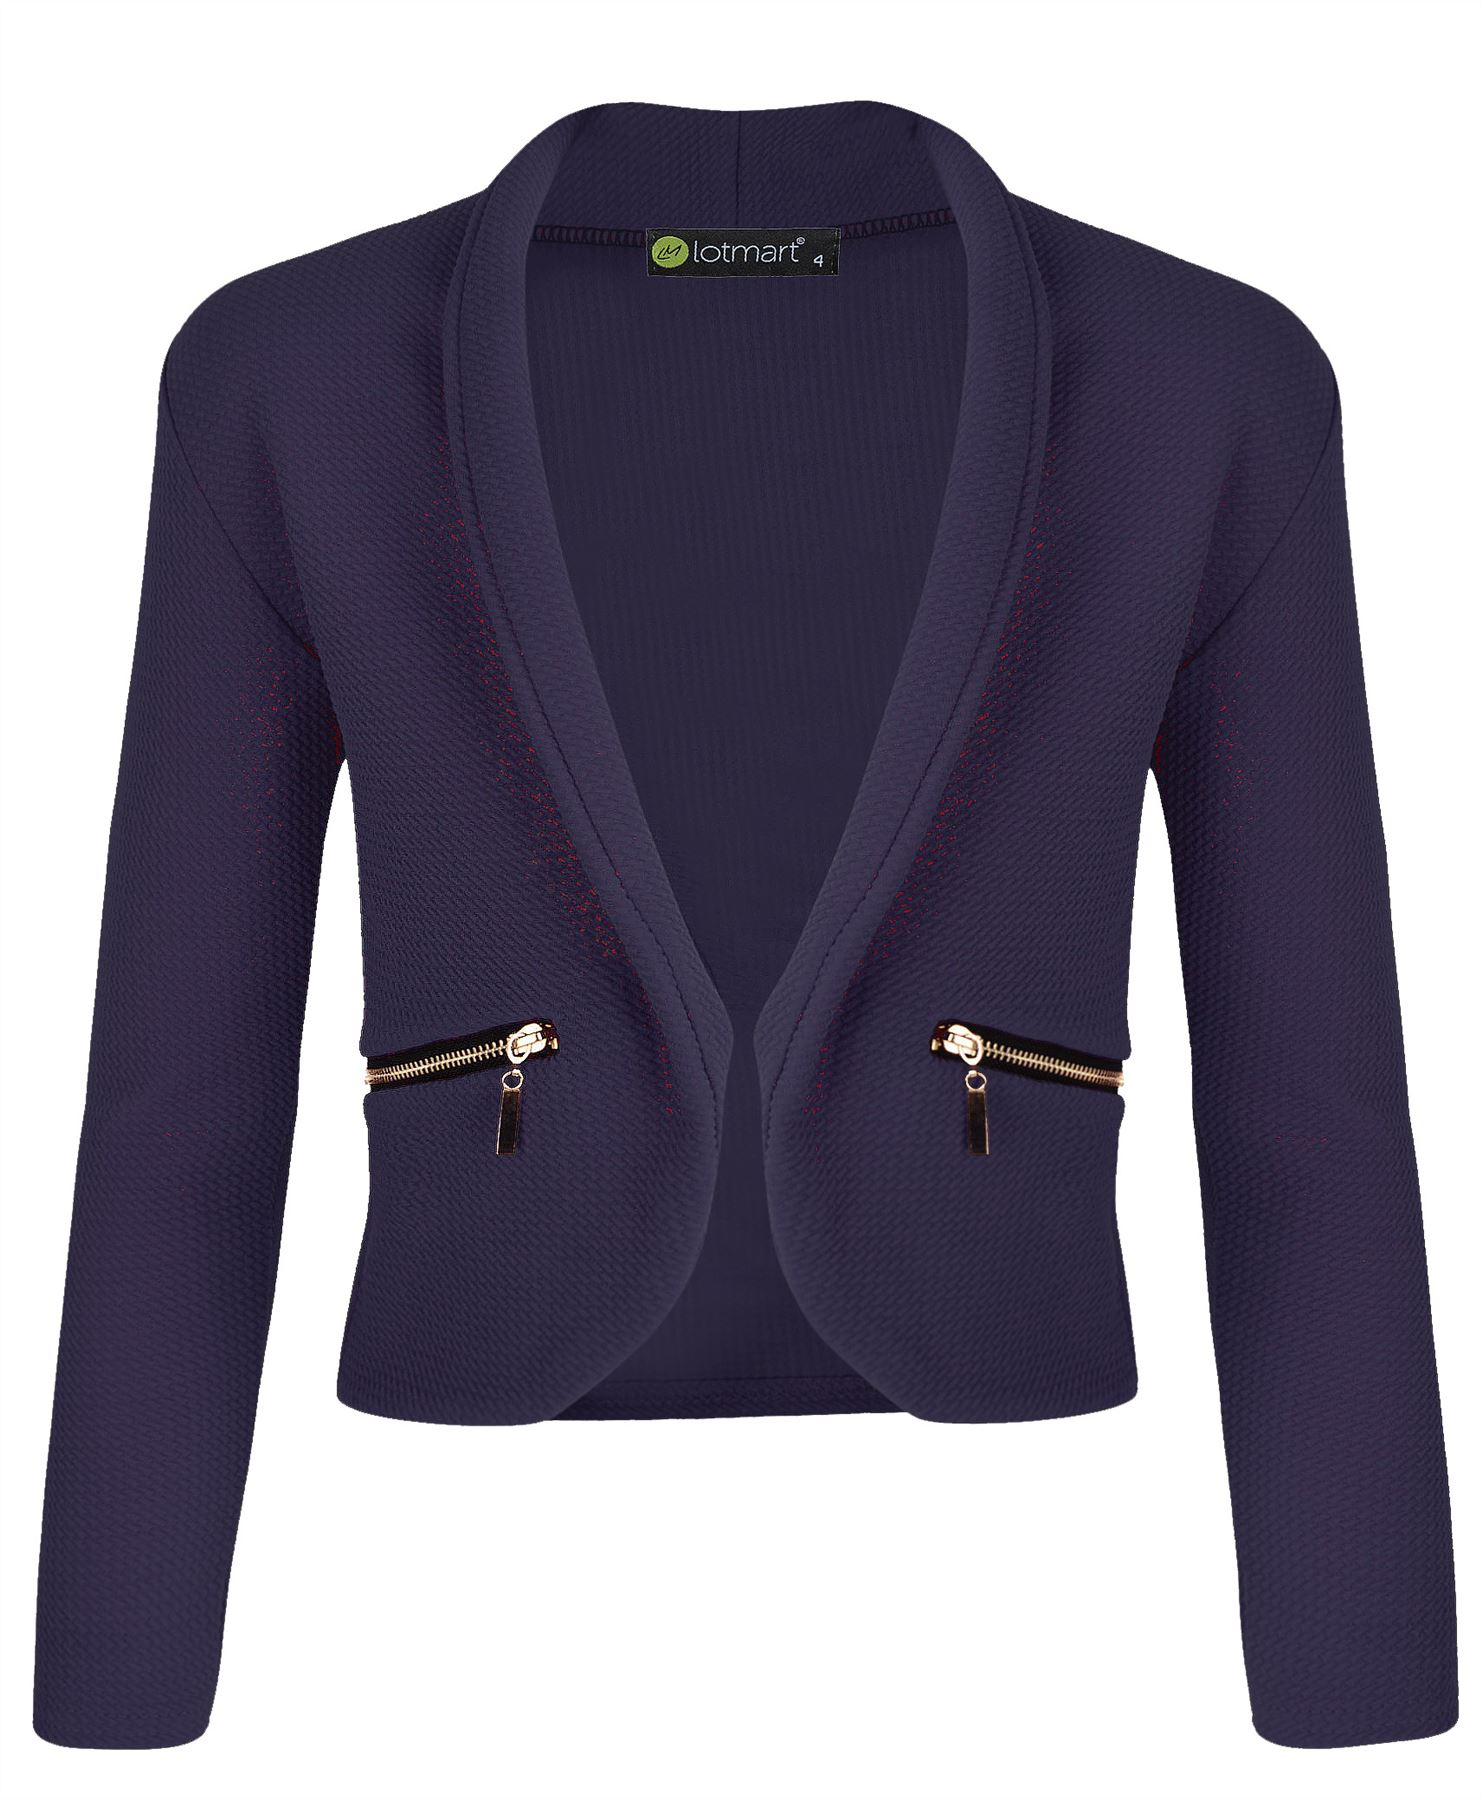 Girls-Long-Sleeve-Open-Front-Blazer-Zip-Pocket-Jacket-Kids-Cardigan-Top-3-14-Y thumbnail 9